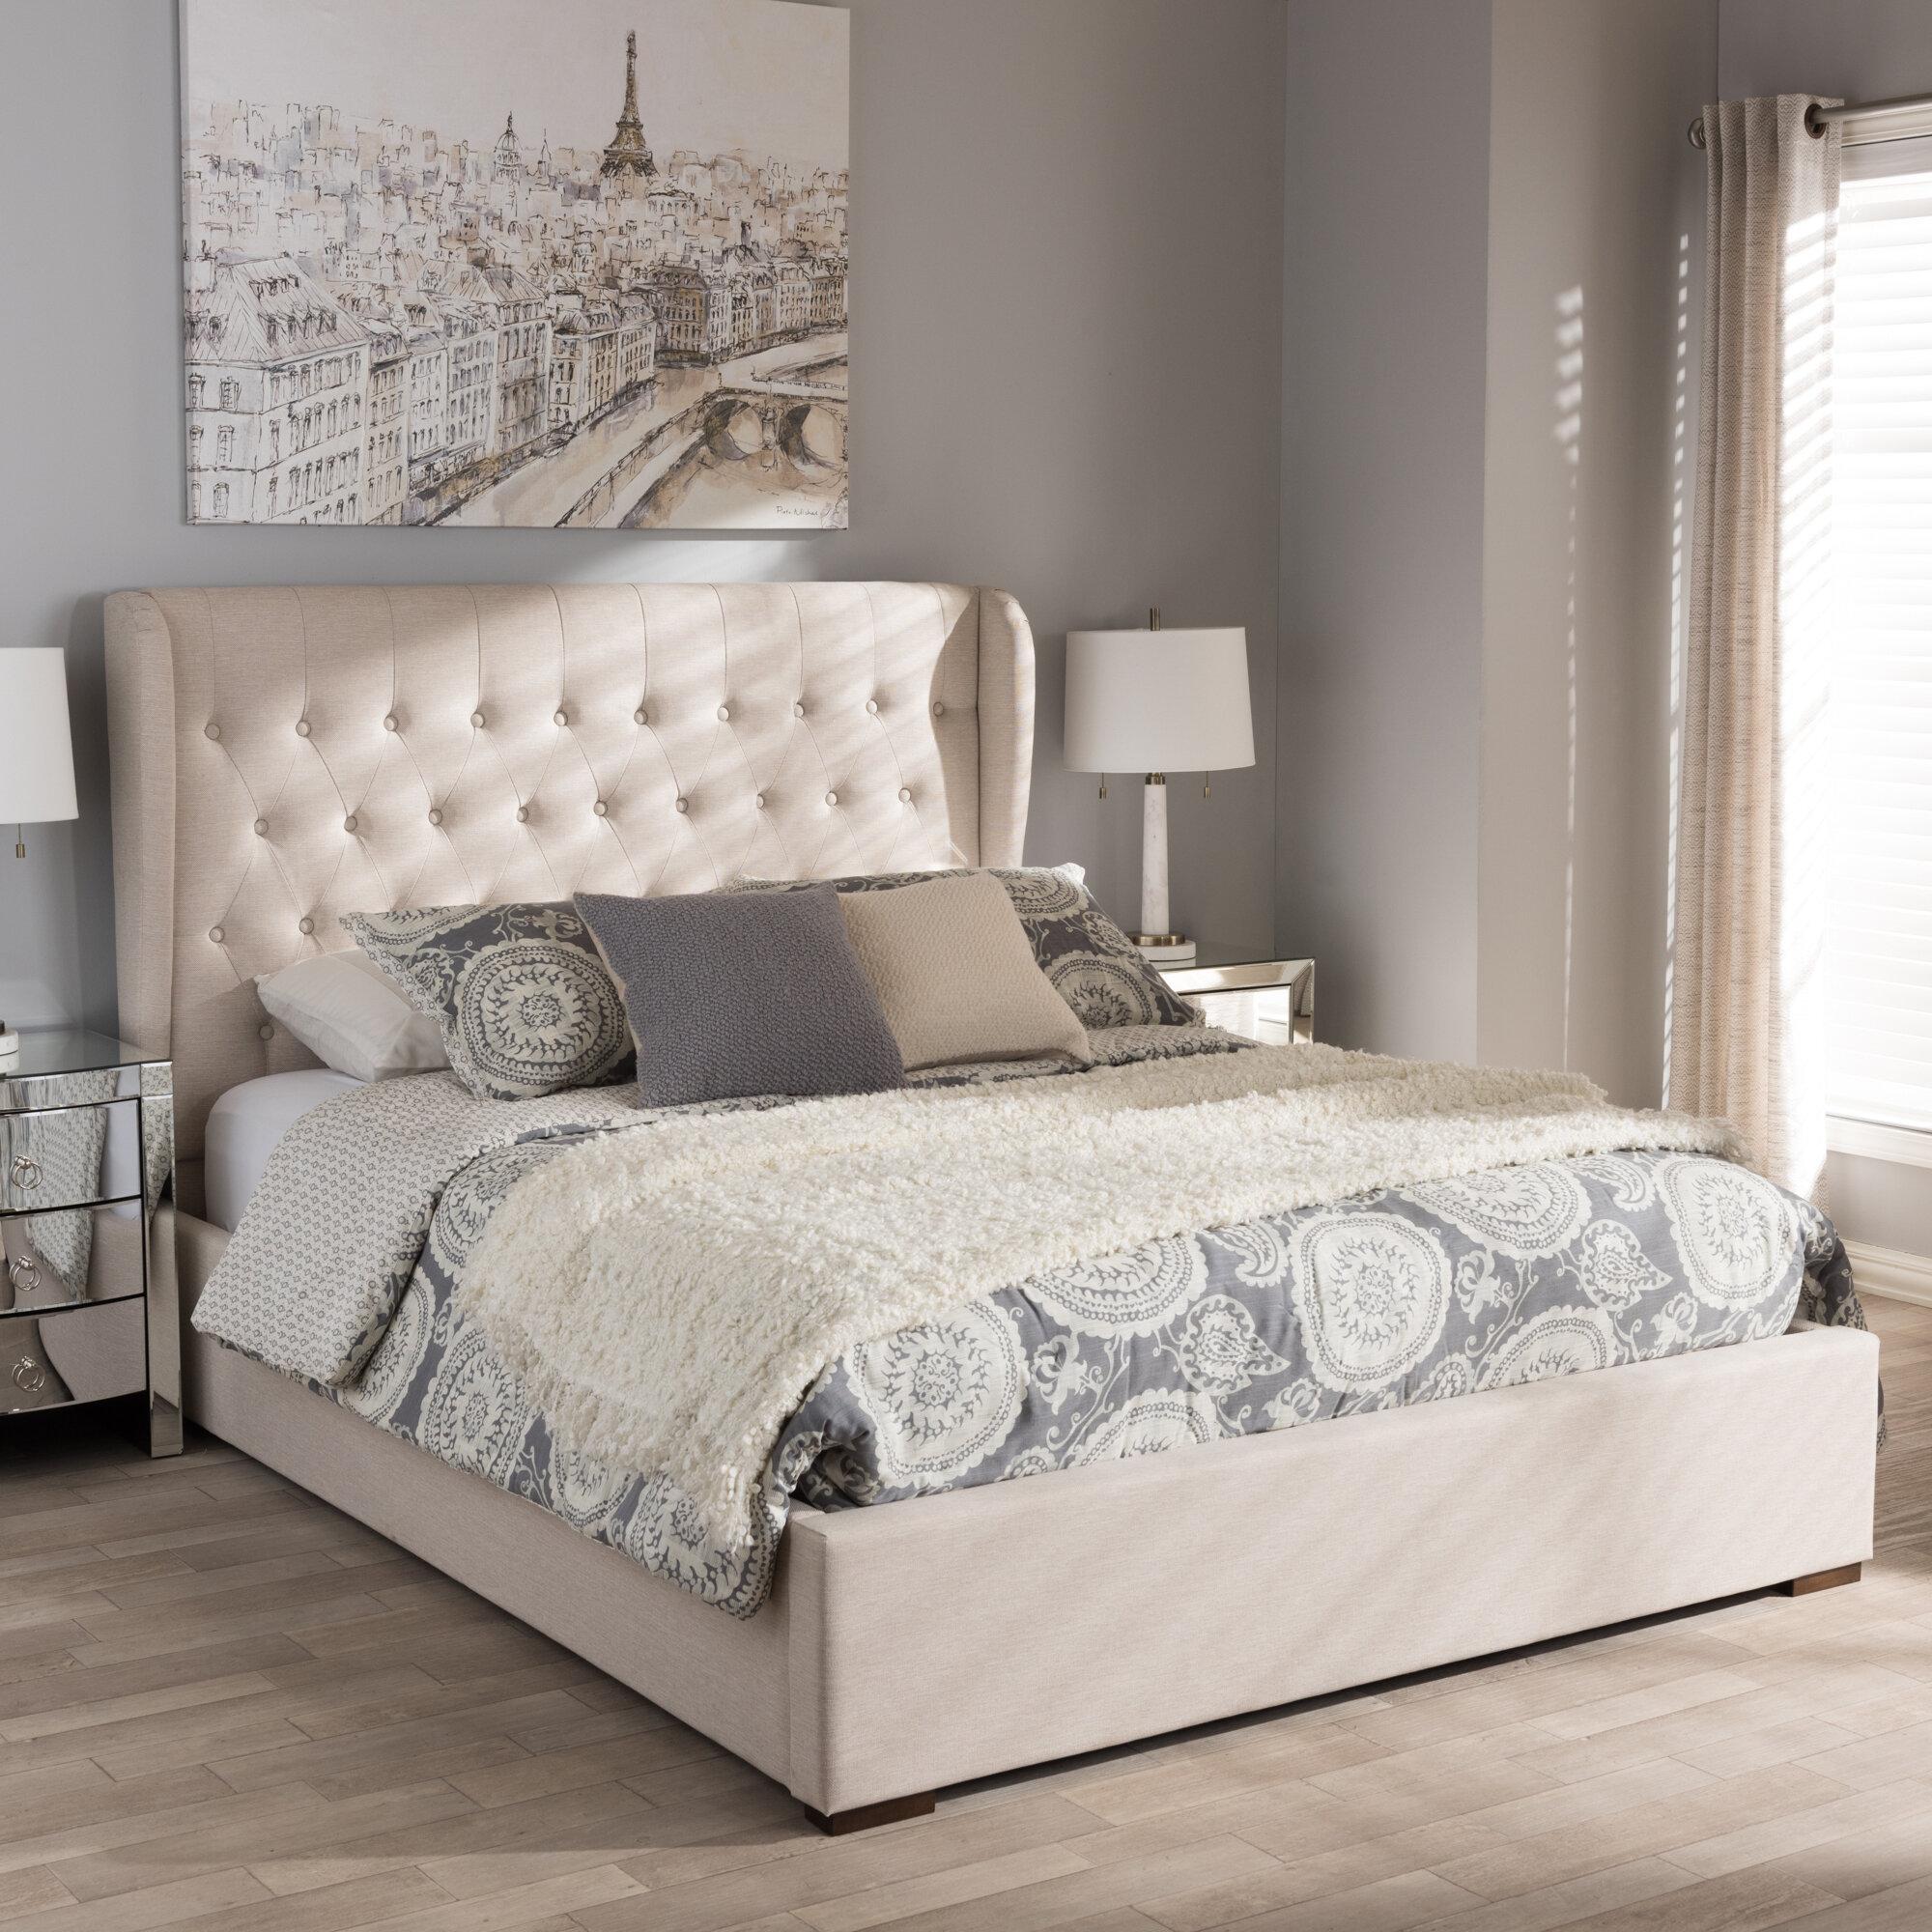 Birch Lane Sedgwick Queen Contemporary Wood Upholstered Storage Platform Bed Reviews Wayfair